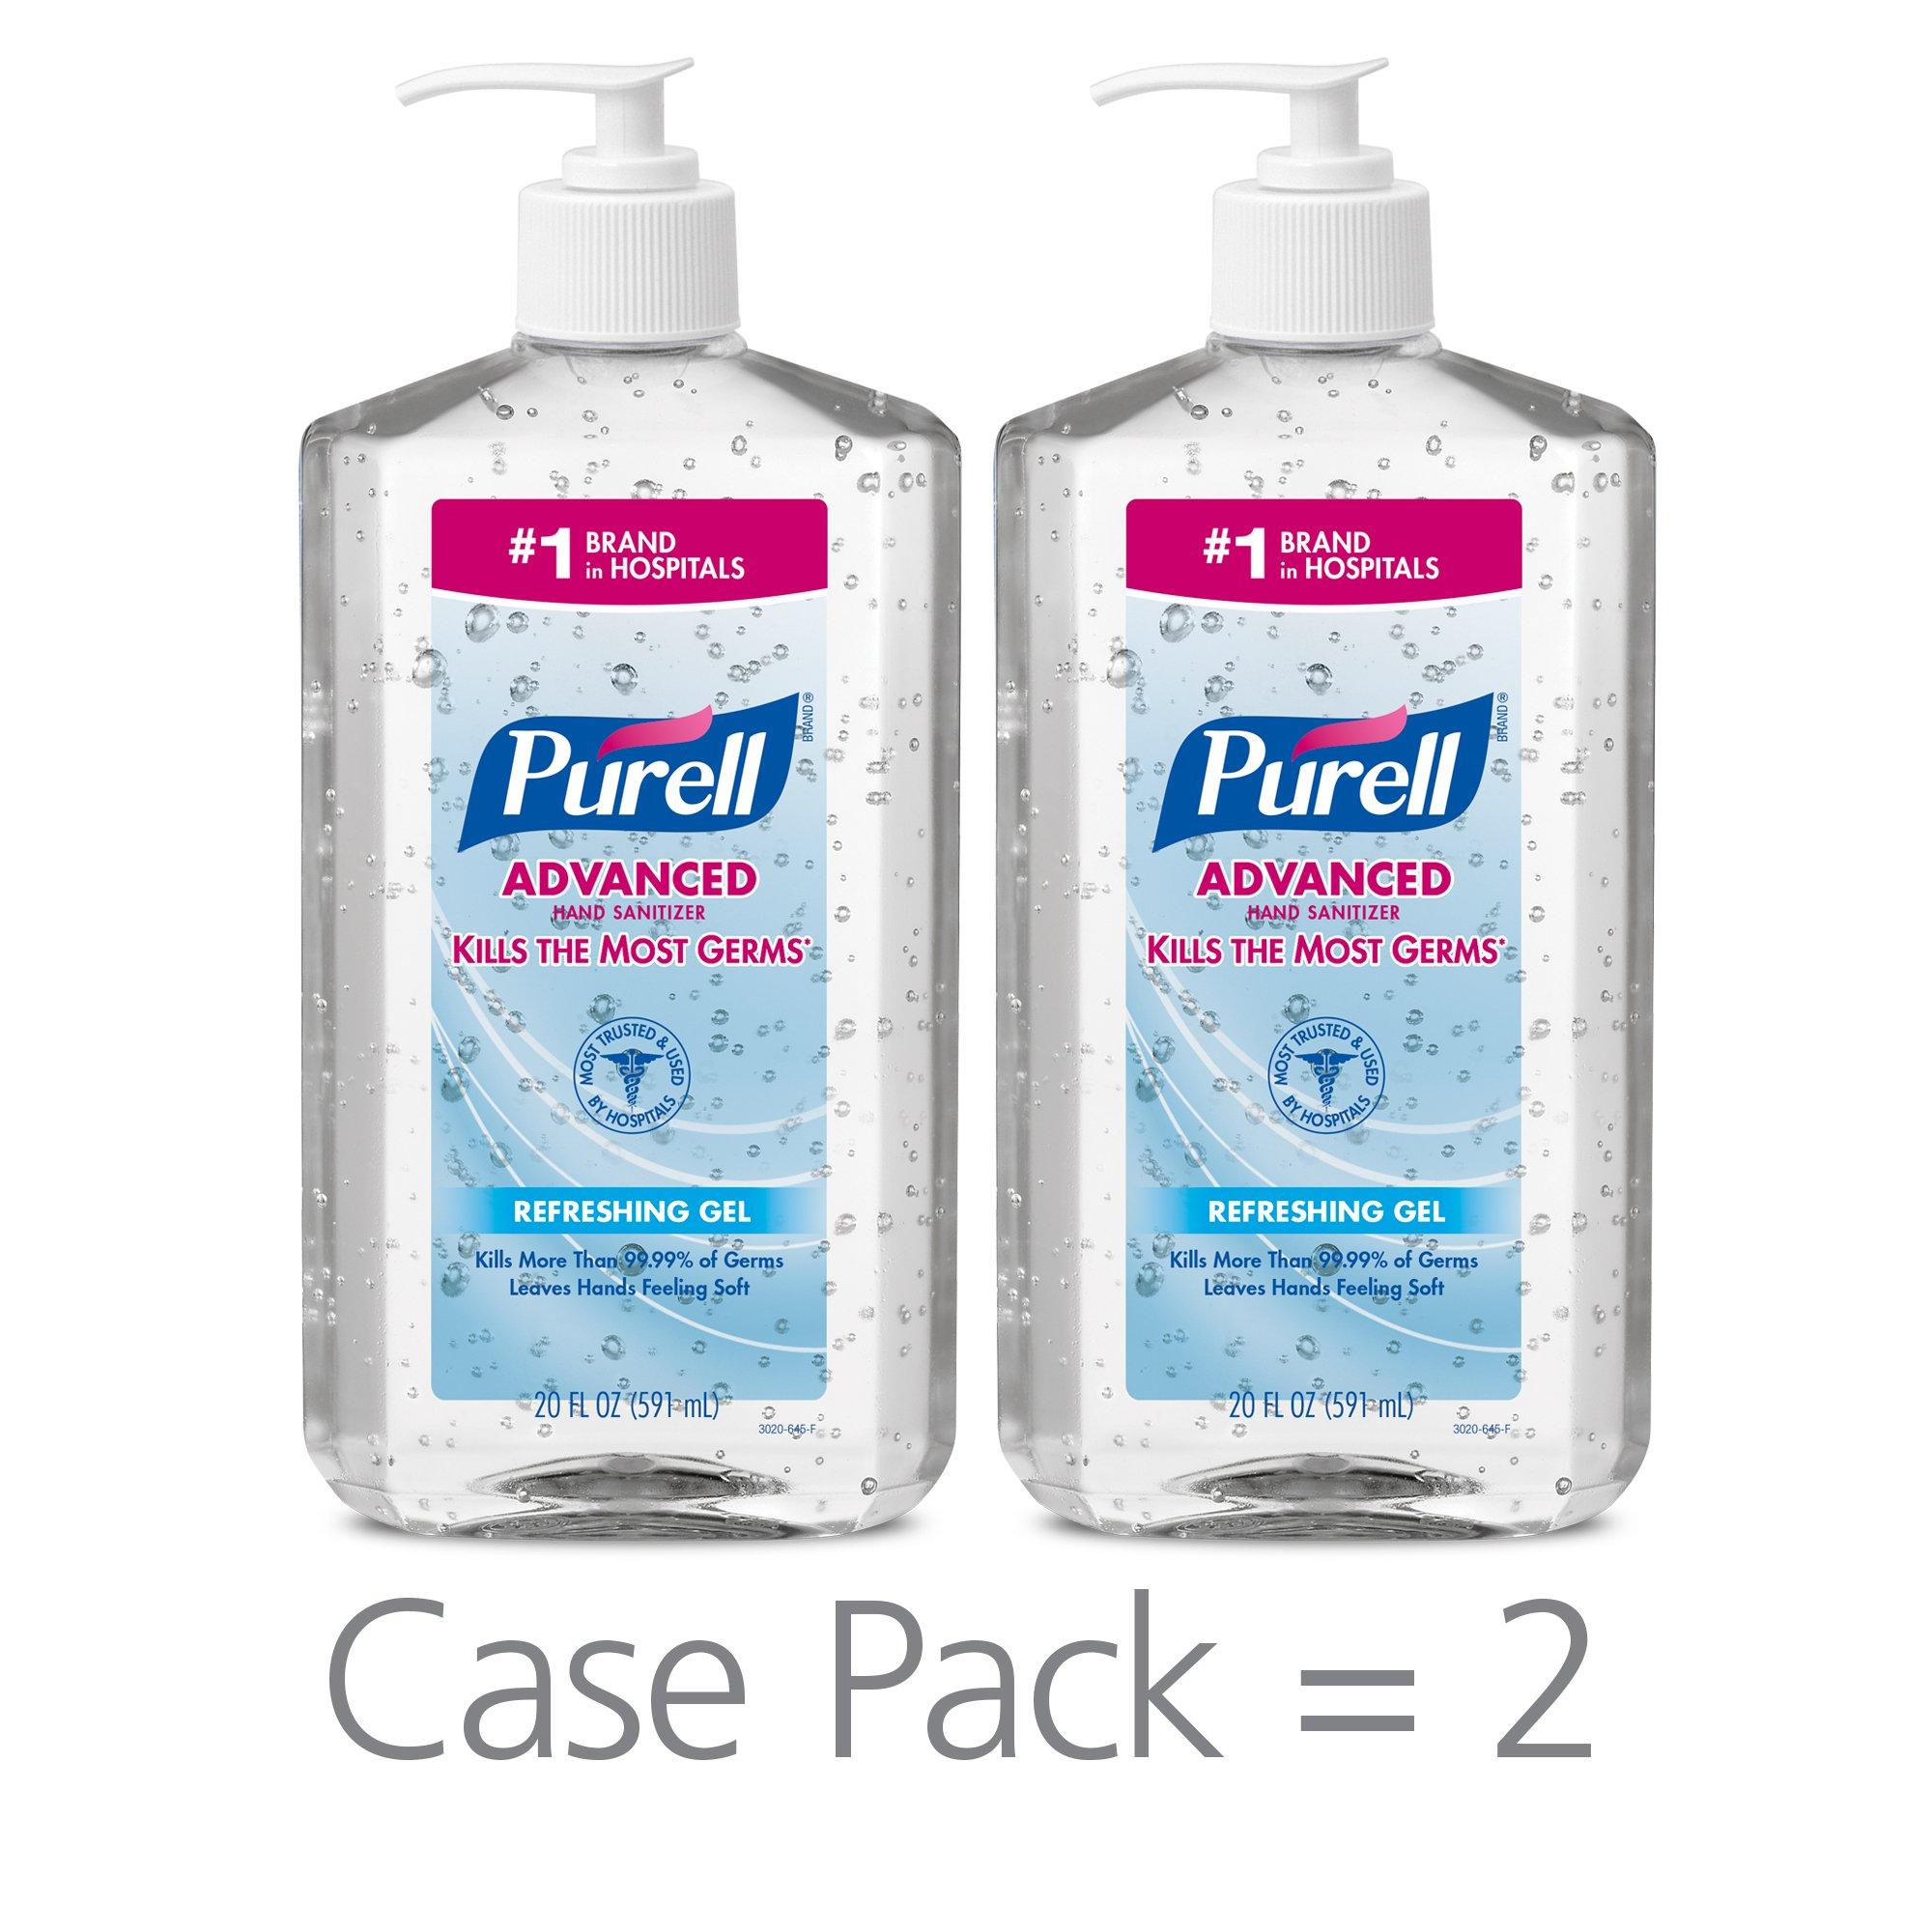 PURELL Advanced Hand Sanitizer, Refreshing Gel, 20 fl oz Hand Sanitizer Table Top Pump Bottles (Pack of 2) - 3023-12-EC by Purell